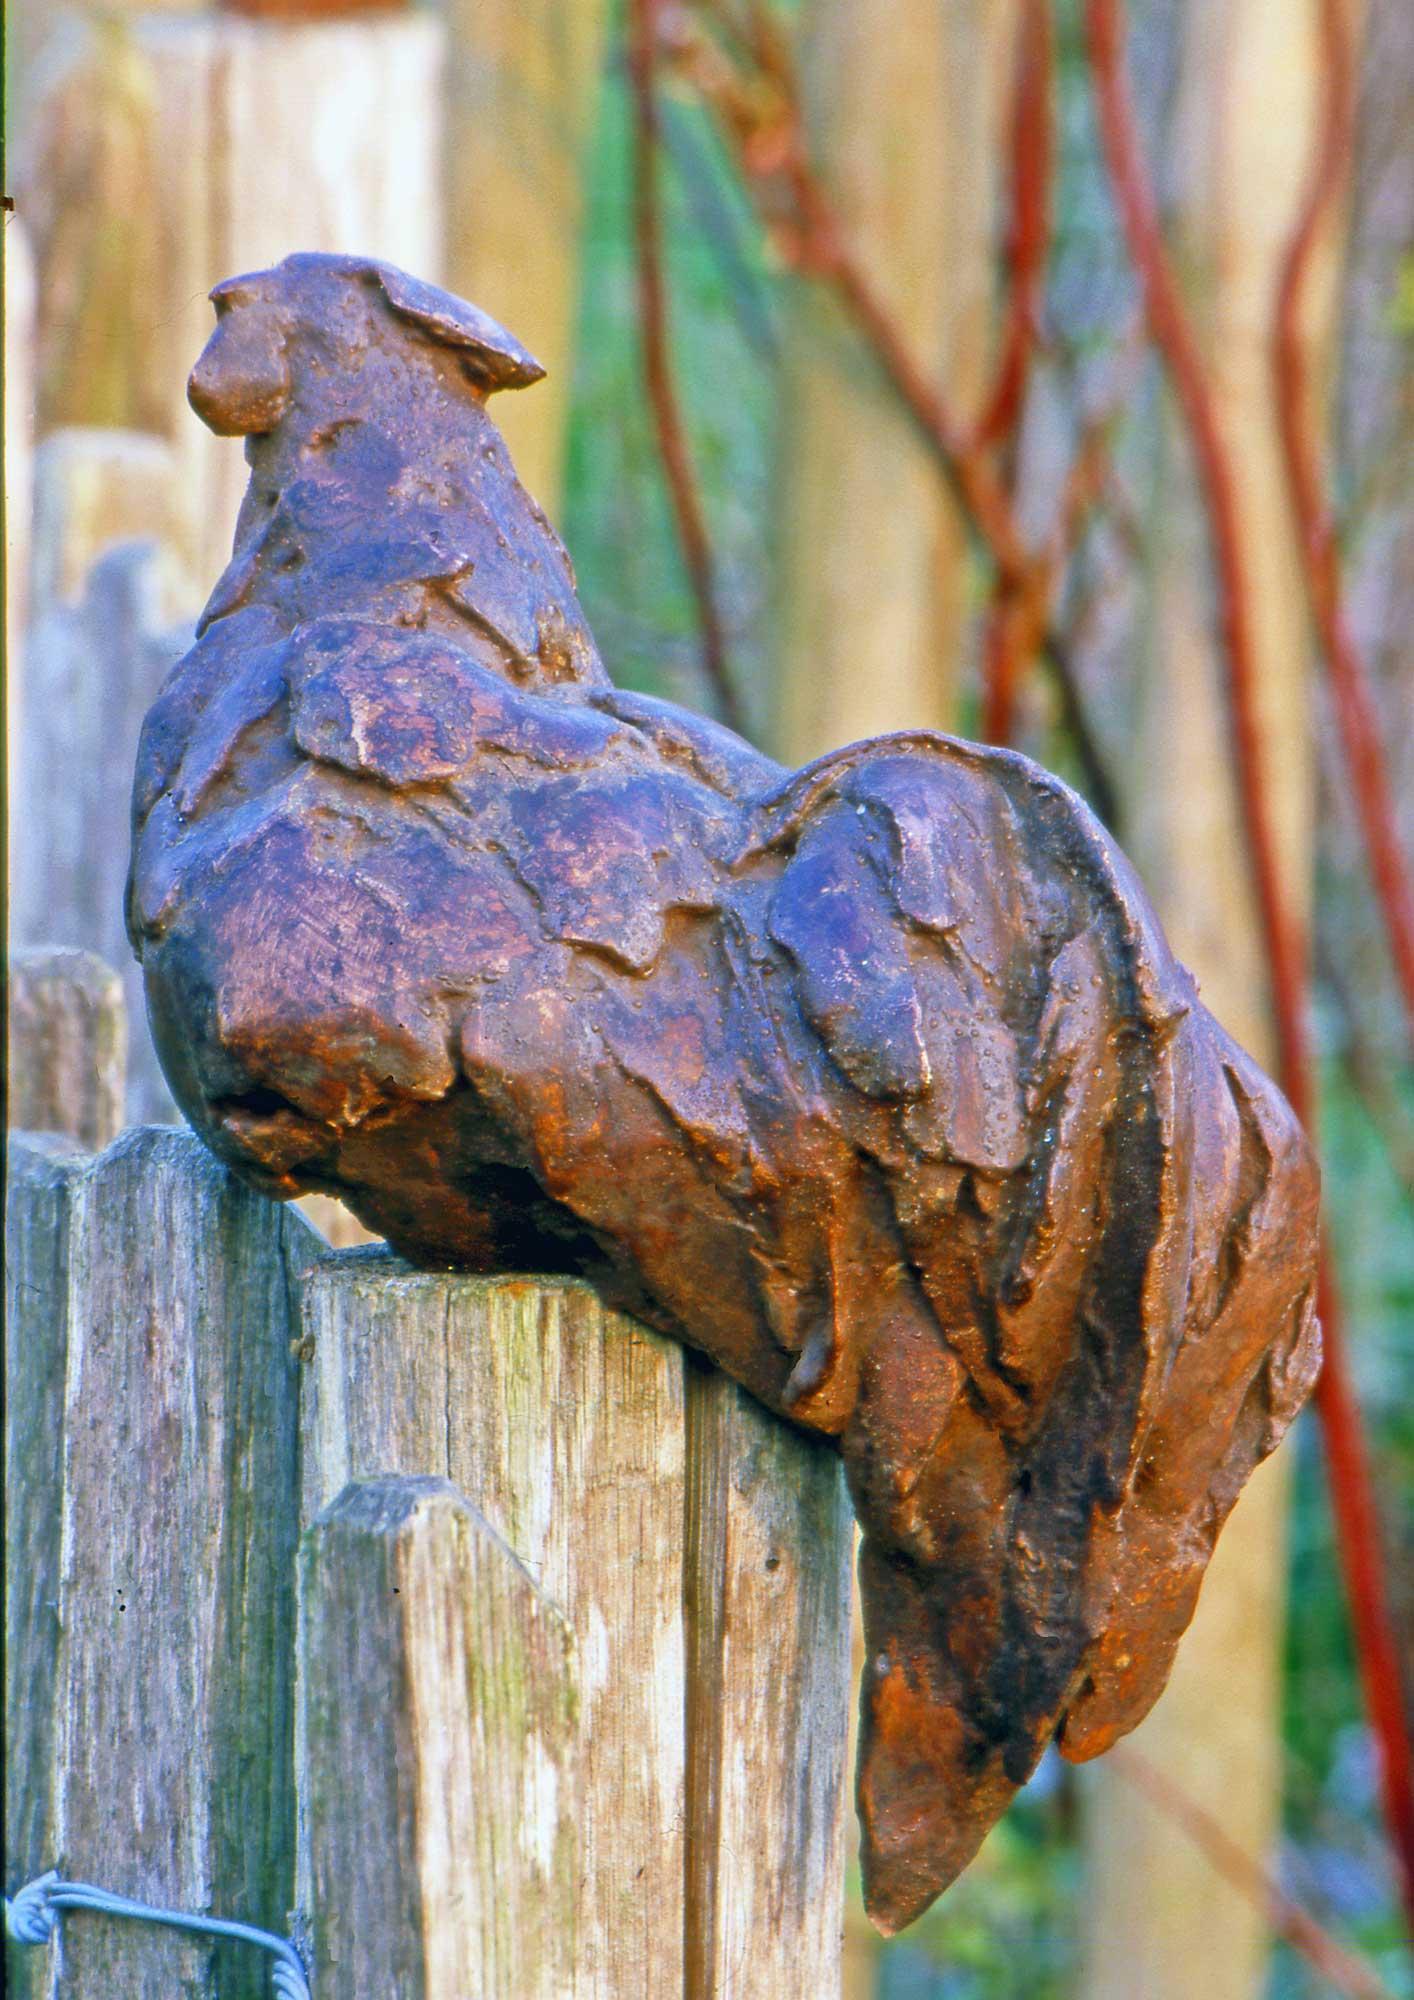 Gert Tabak's Tuinige Zaken: Januari in Beeld